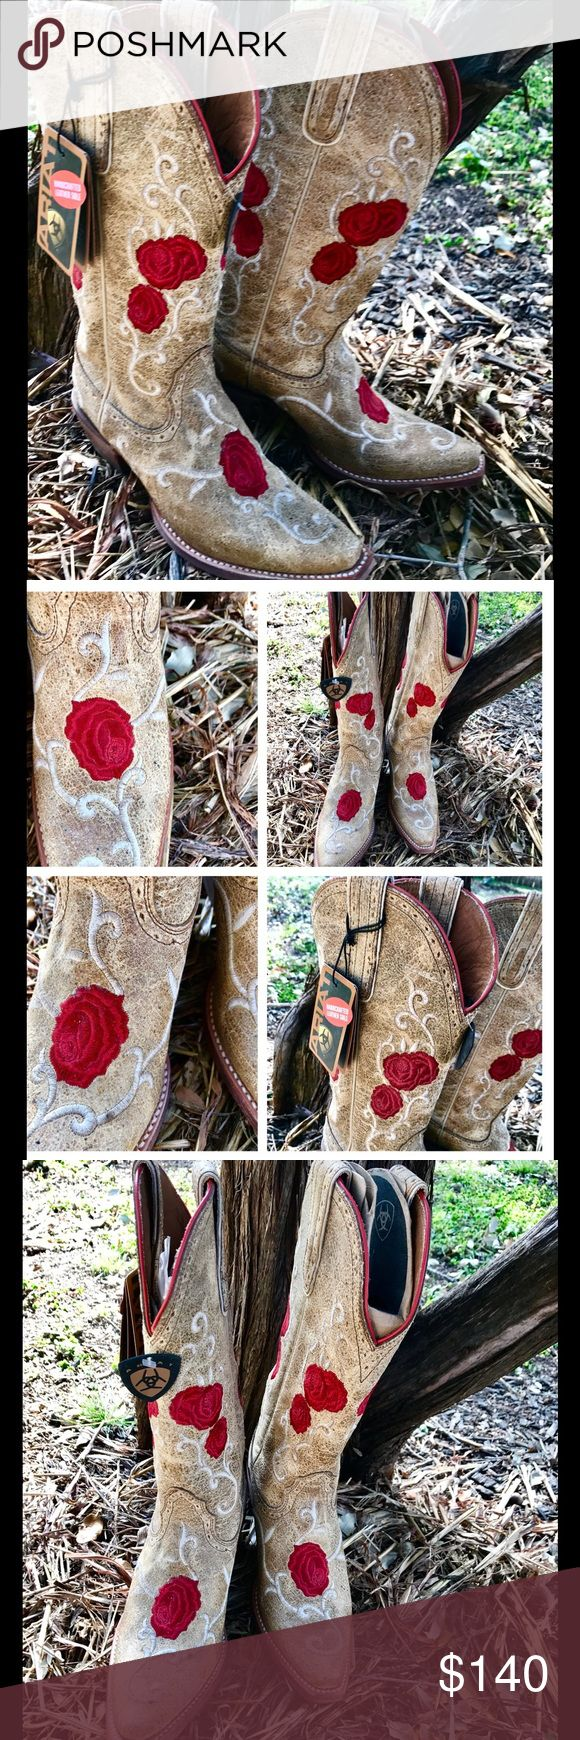 Ariat Women's Western Boots New Ariat Women's Western Boots New Ariat Shoes